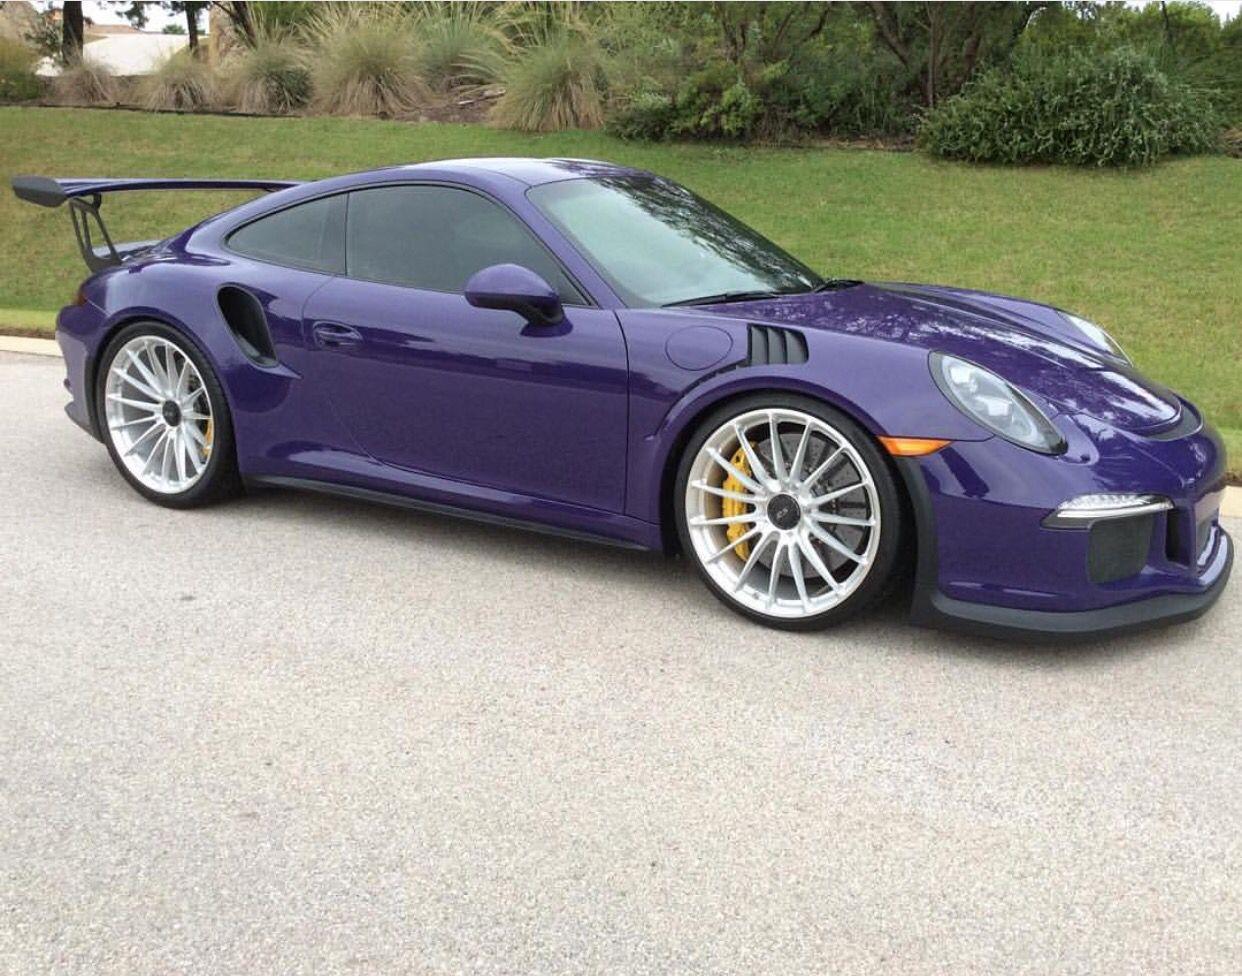 Porsche 991 GT3 RS painted in Ultraviolet Purple w/ HRE